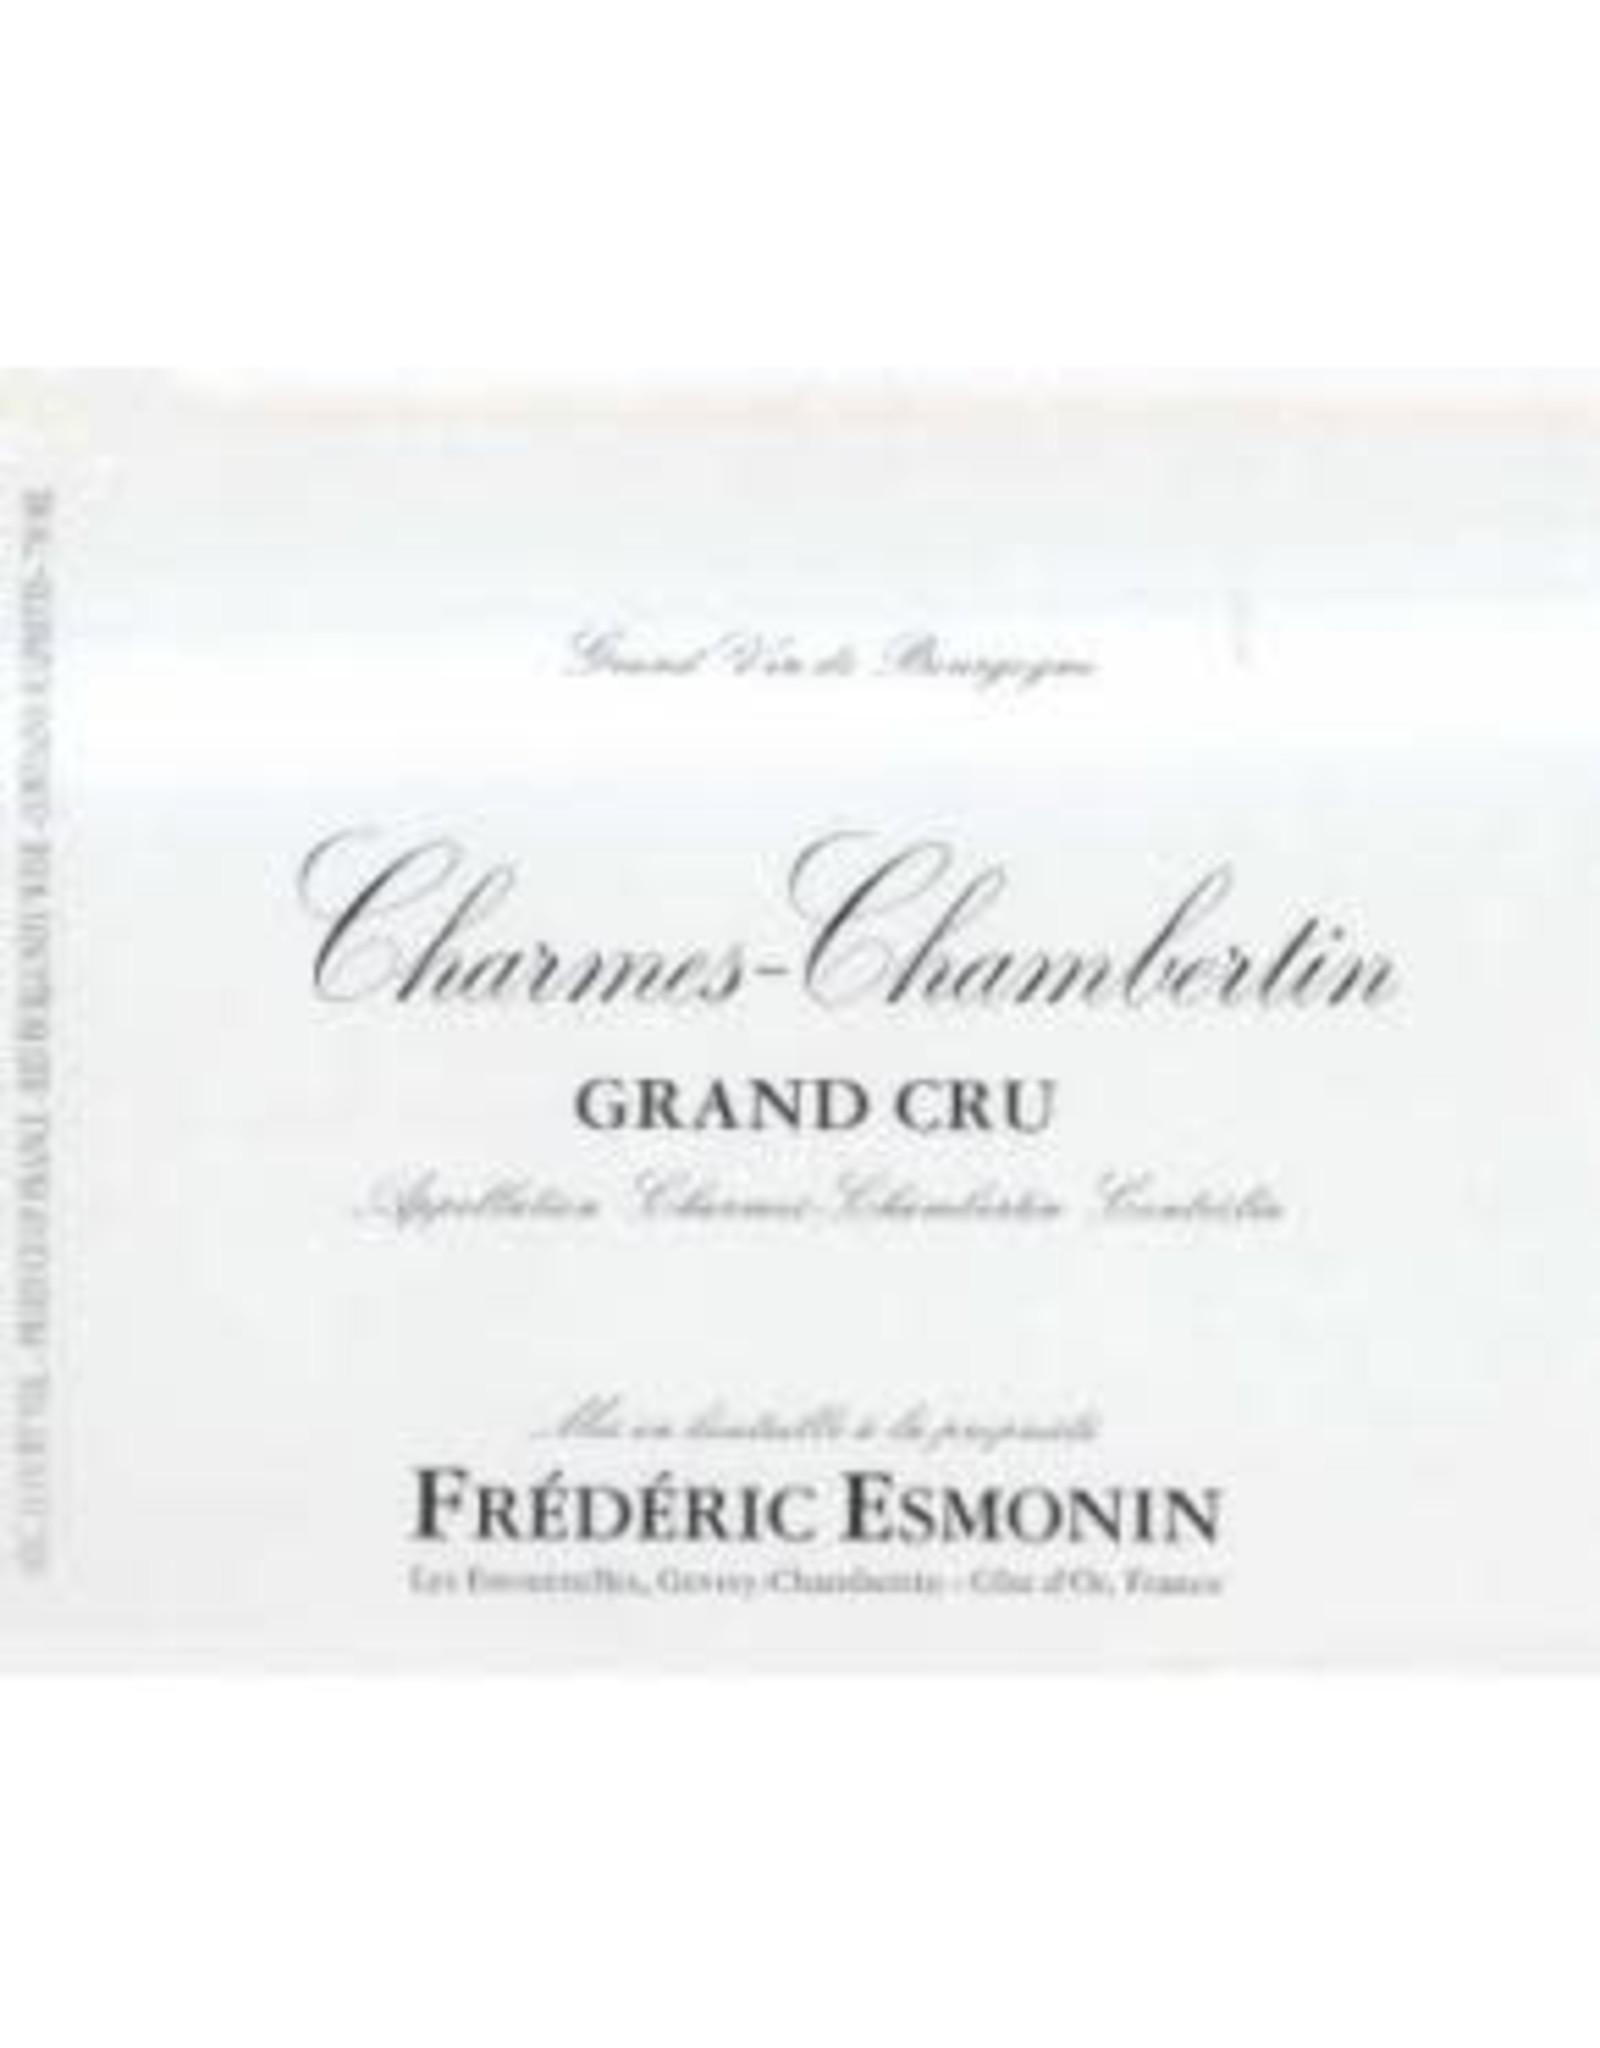 Frederic Esmonin Frederic Esmonin Charmes-Chambertin Grand Cru 2017